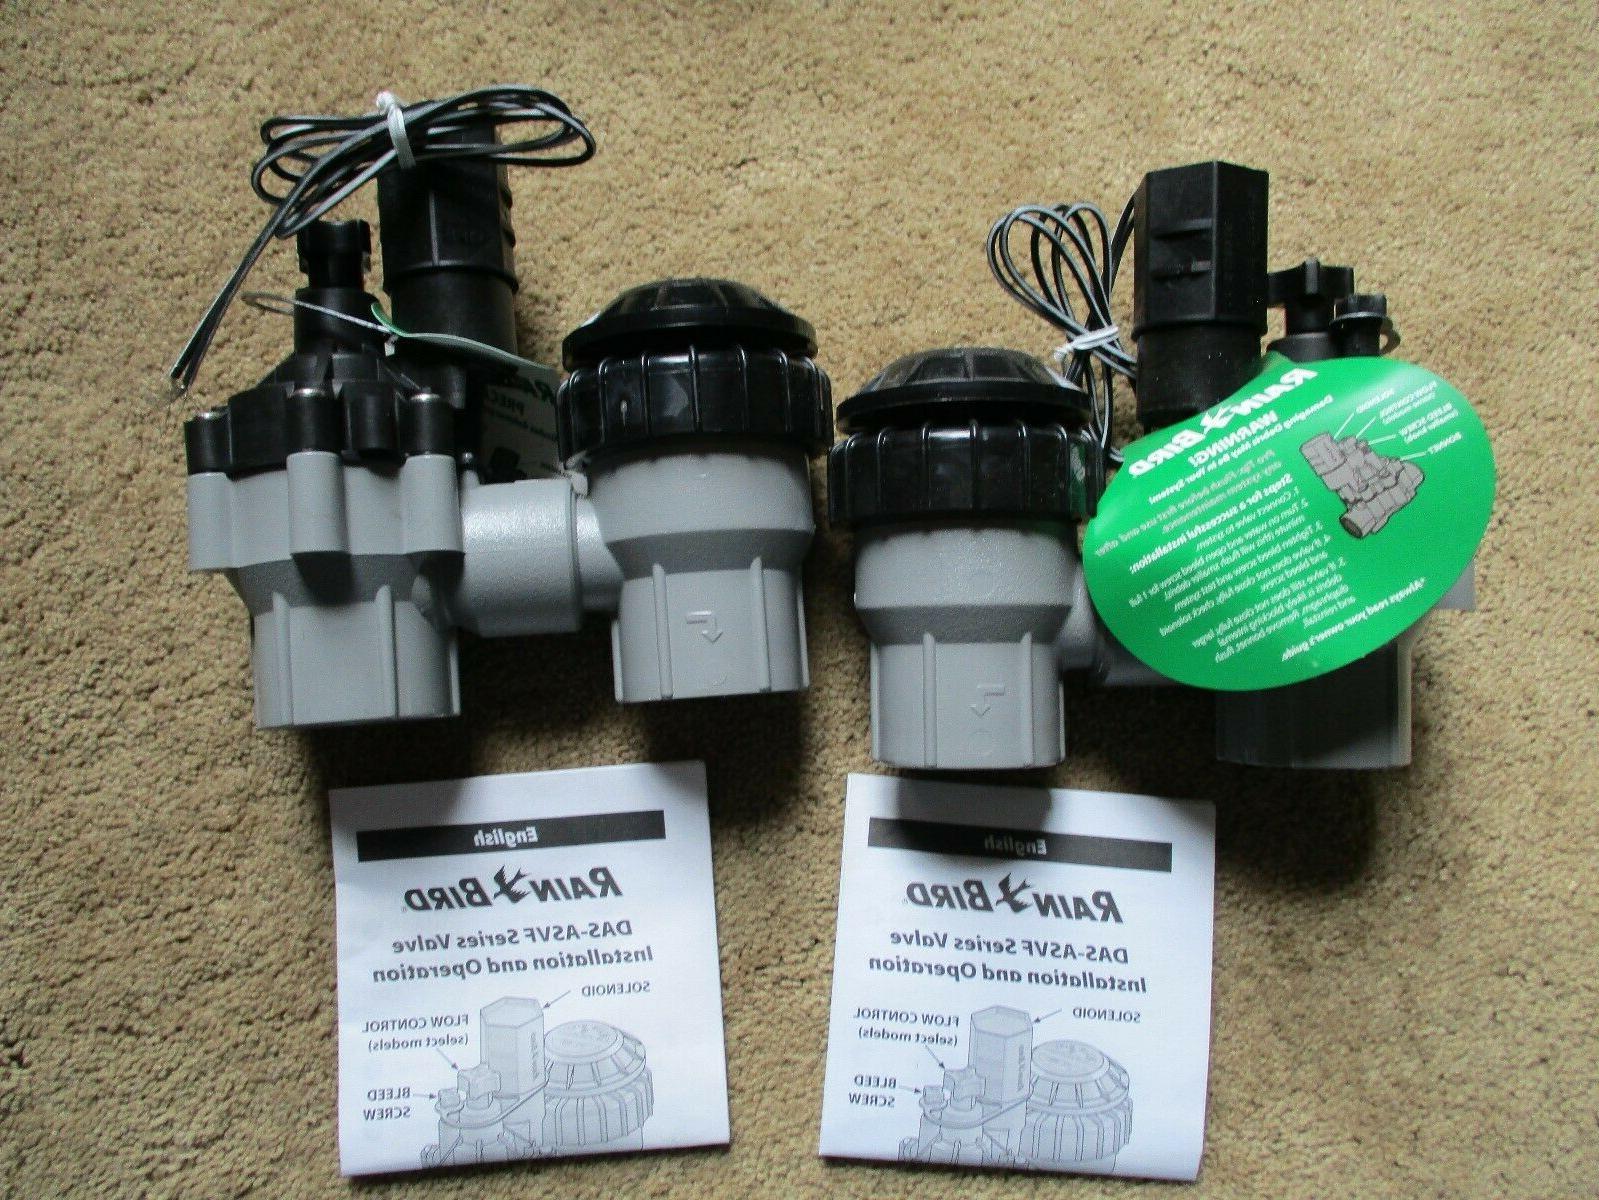 dlx elect antisiphon valve